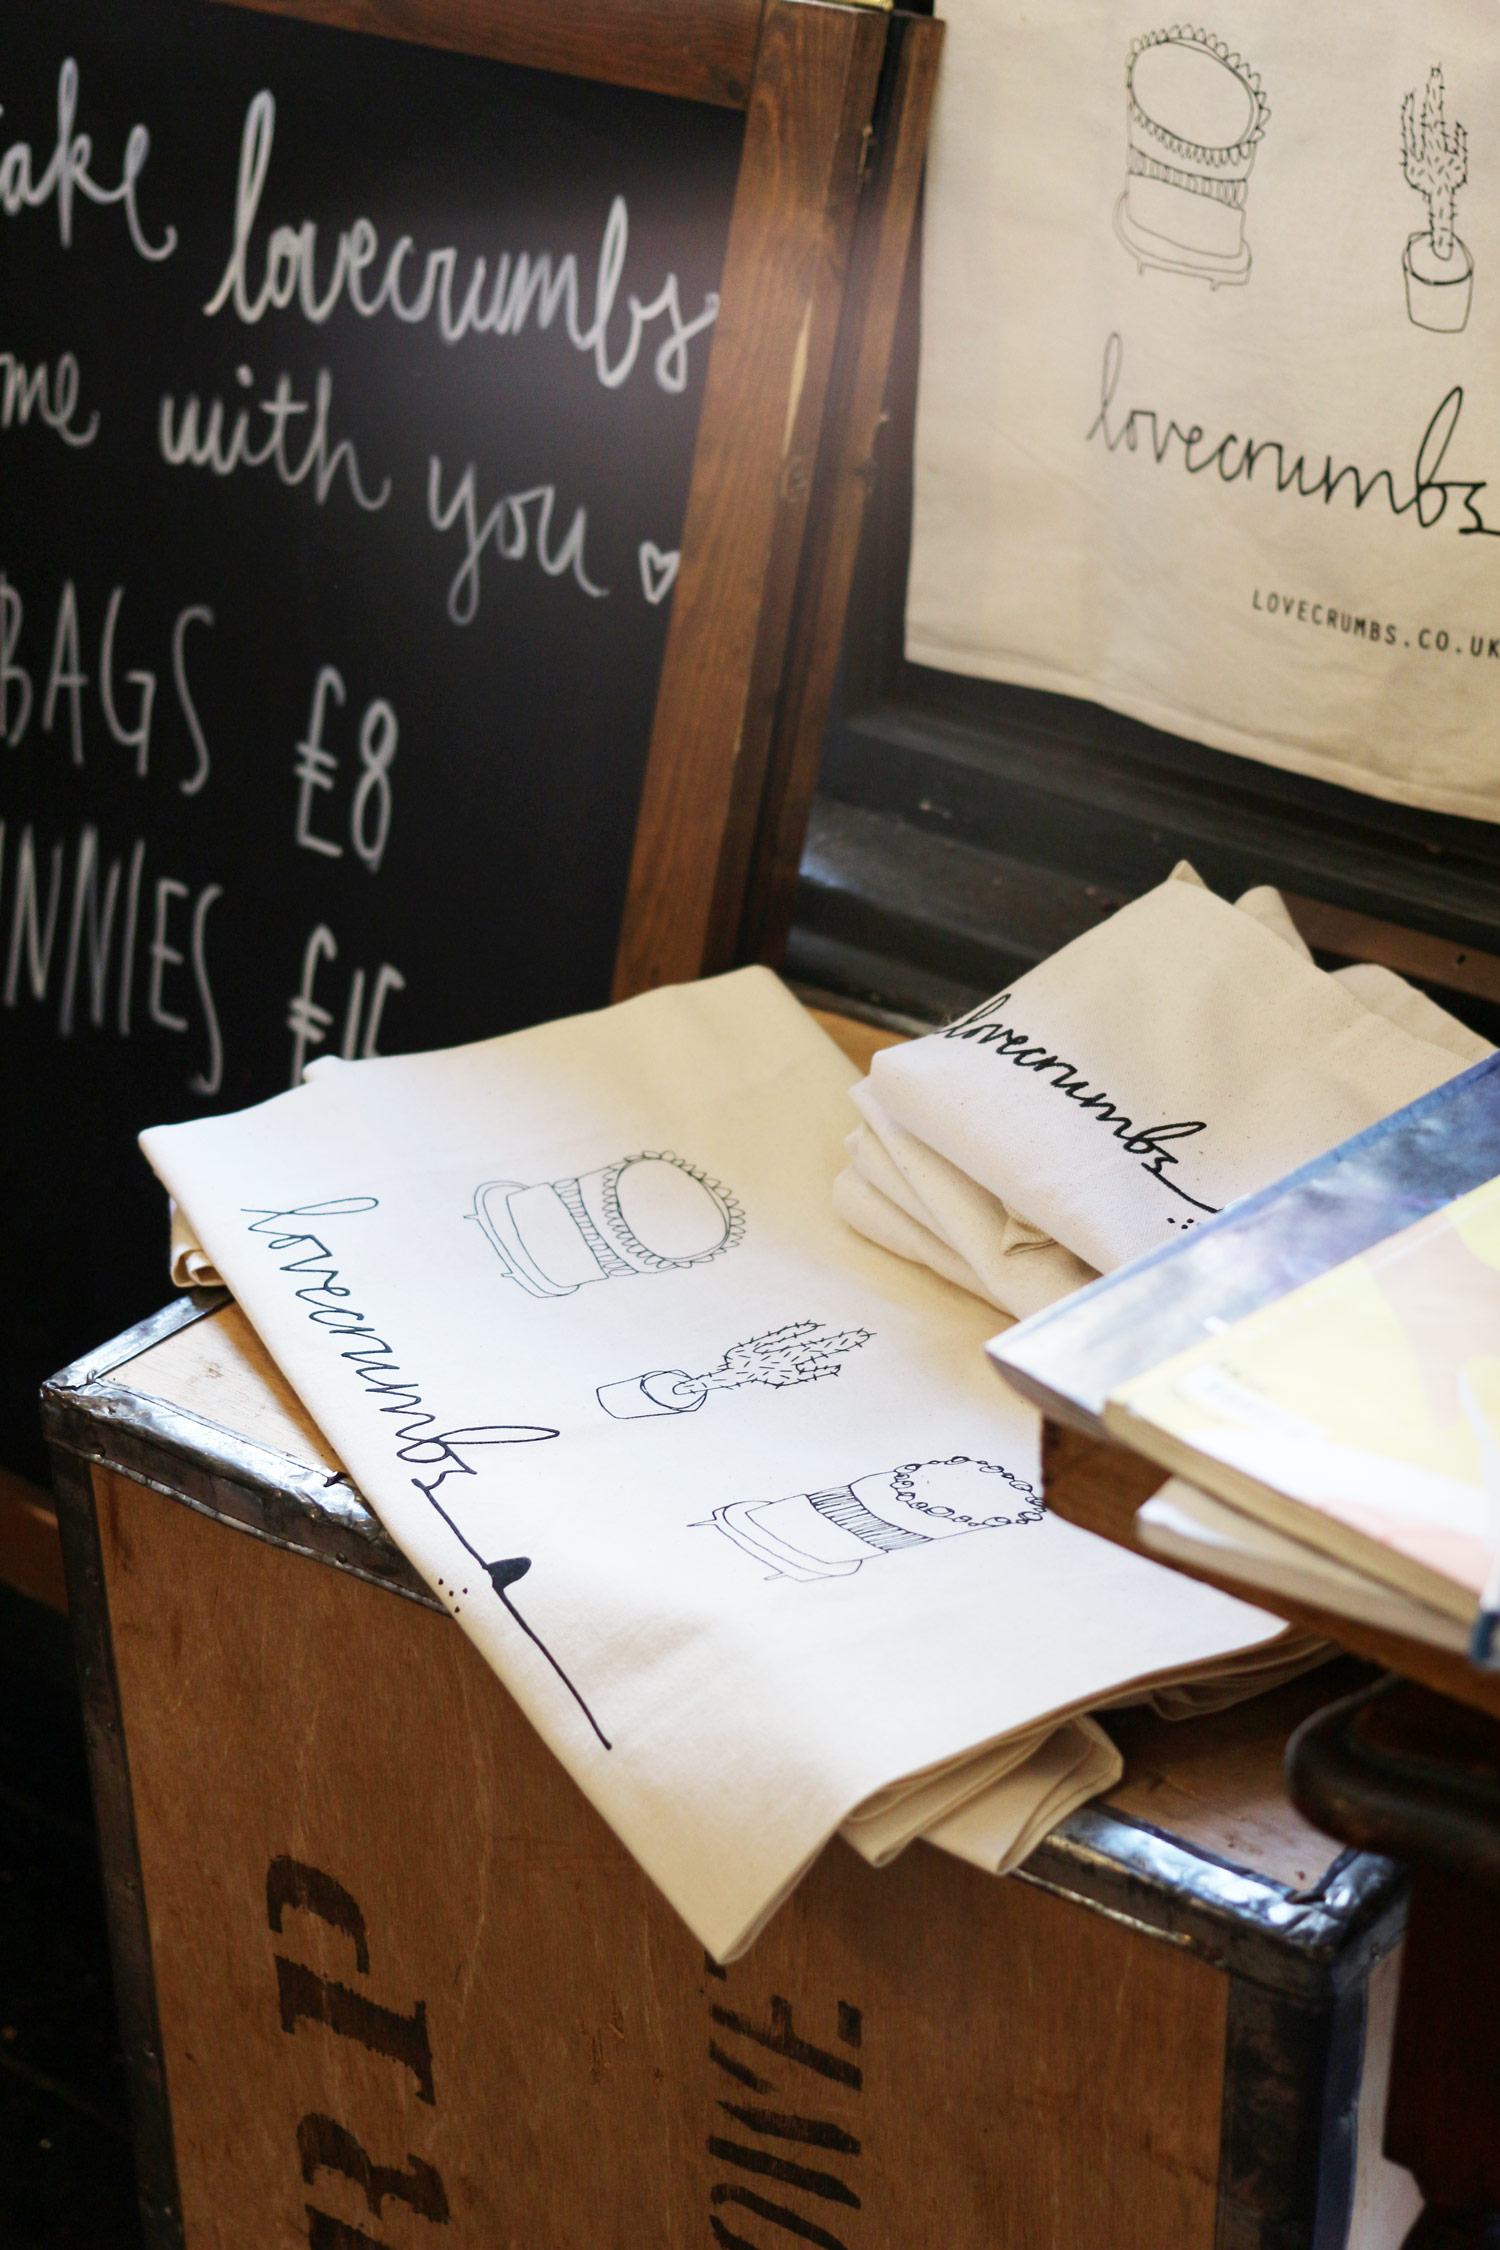 edinburgh-scotland-mercure-hotels-review-uk-travel-blogger-lifestyle-lovecrumbs-5